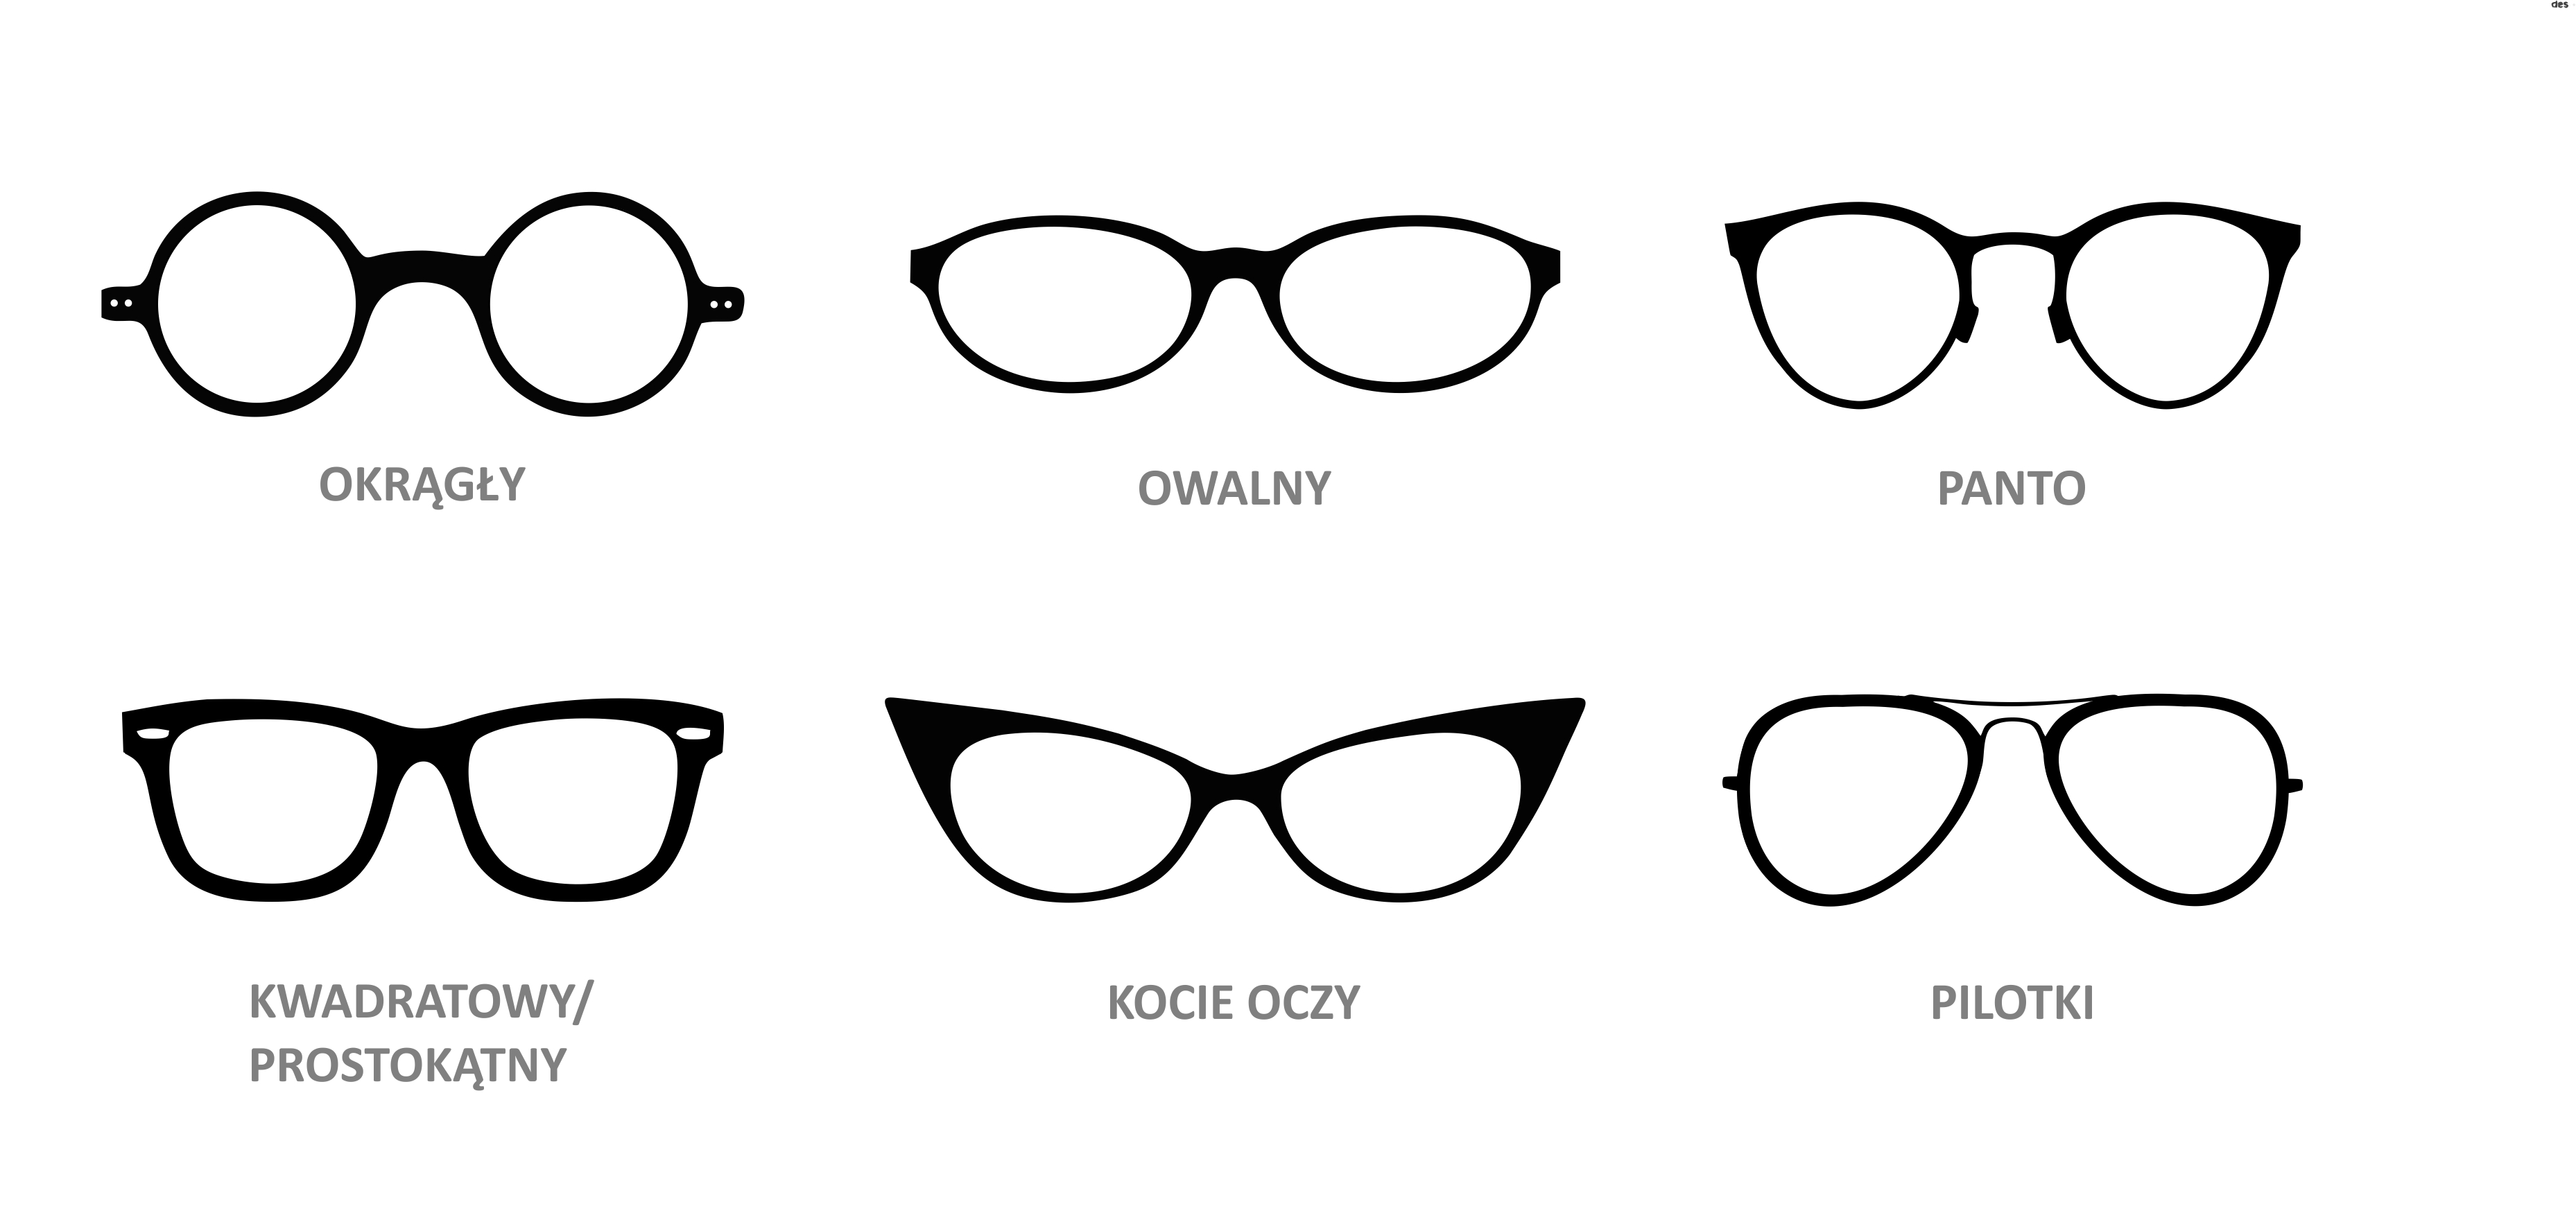 Oprawki A Kształt Twarzy Producent Dystrybutor Okularów Americanway